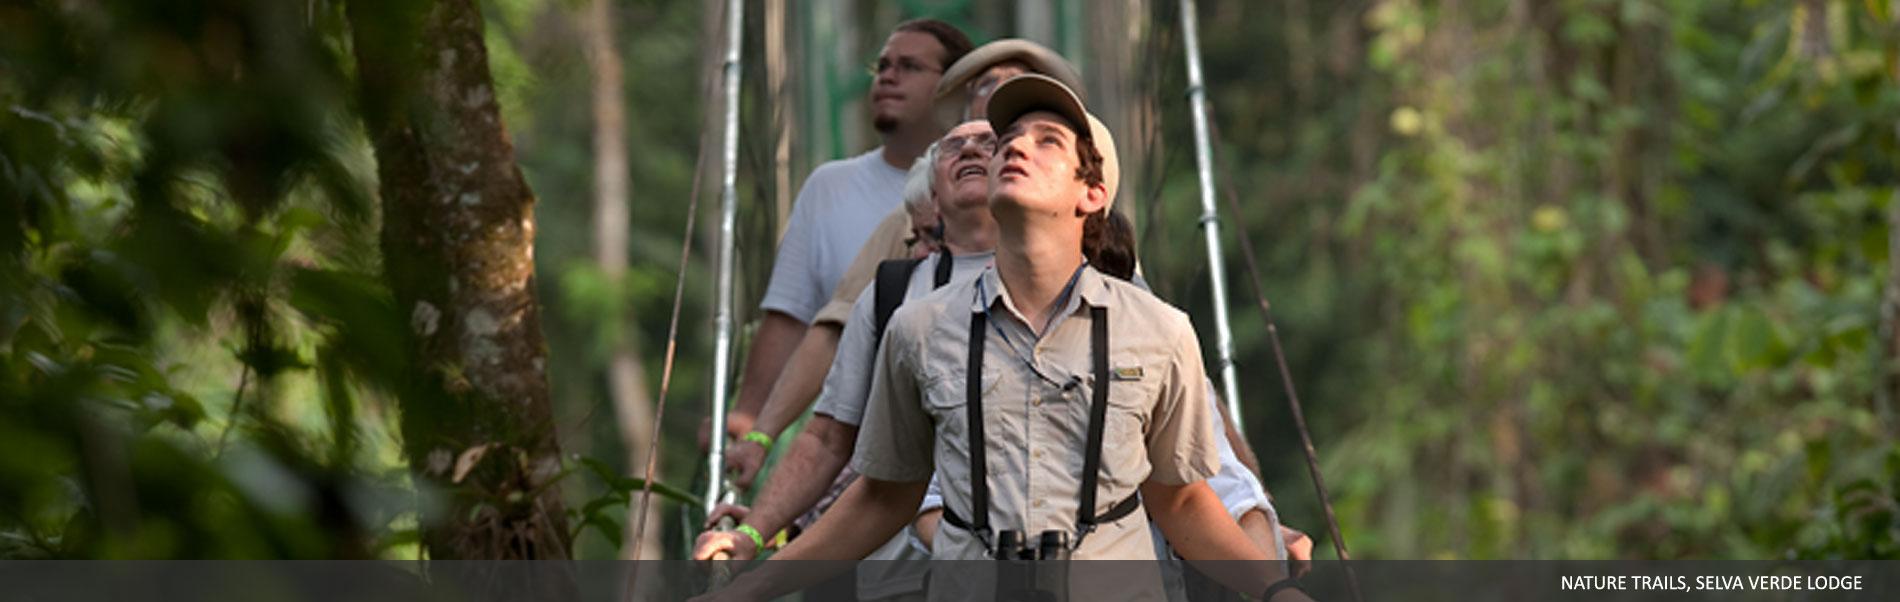 explore-selvaverde-06.jpg